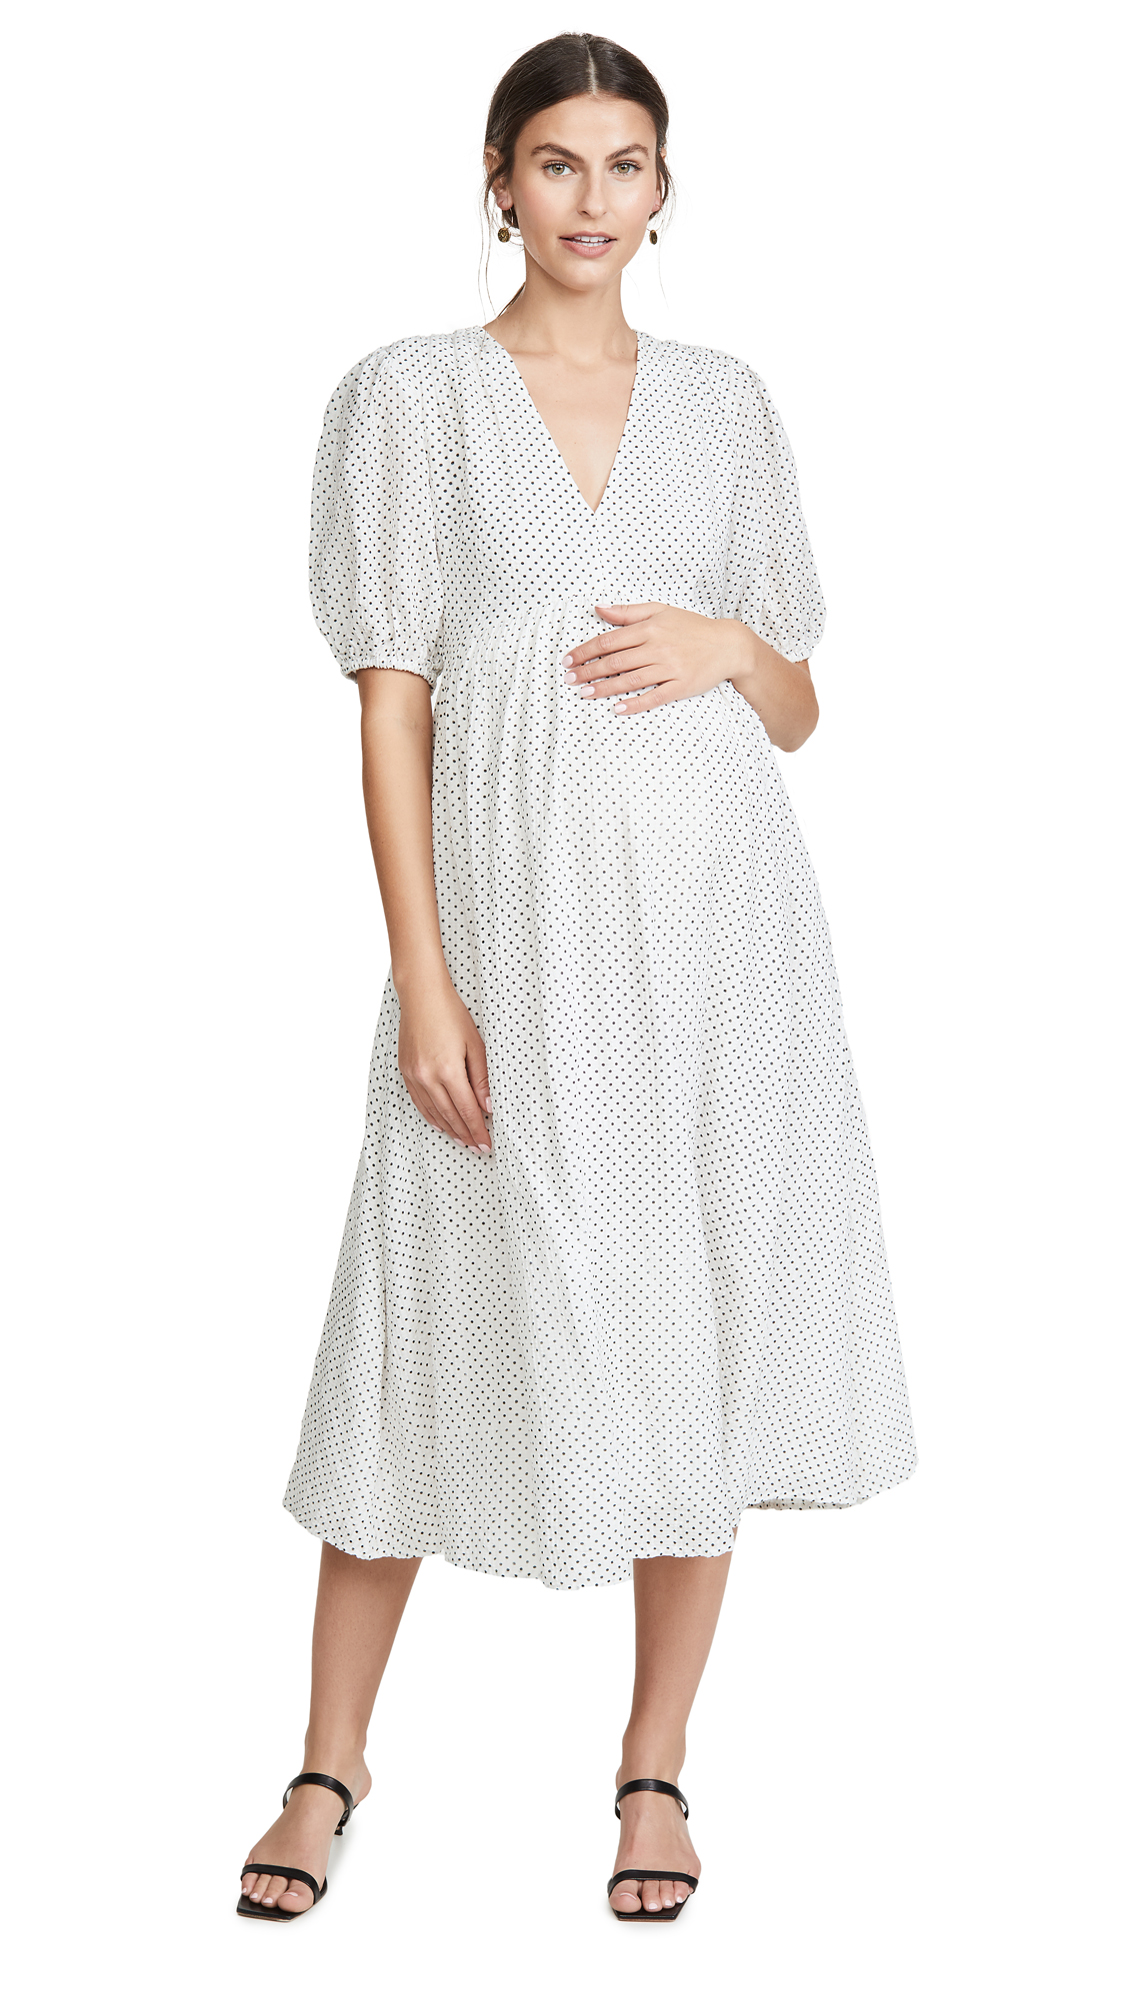 HATCH The Melanie Dress - 30% Off Sale